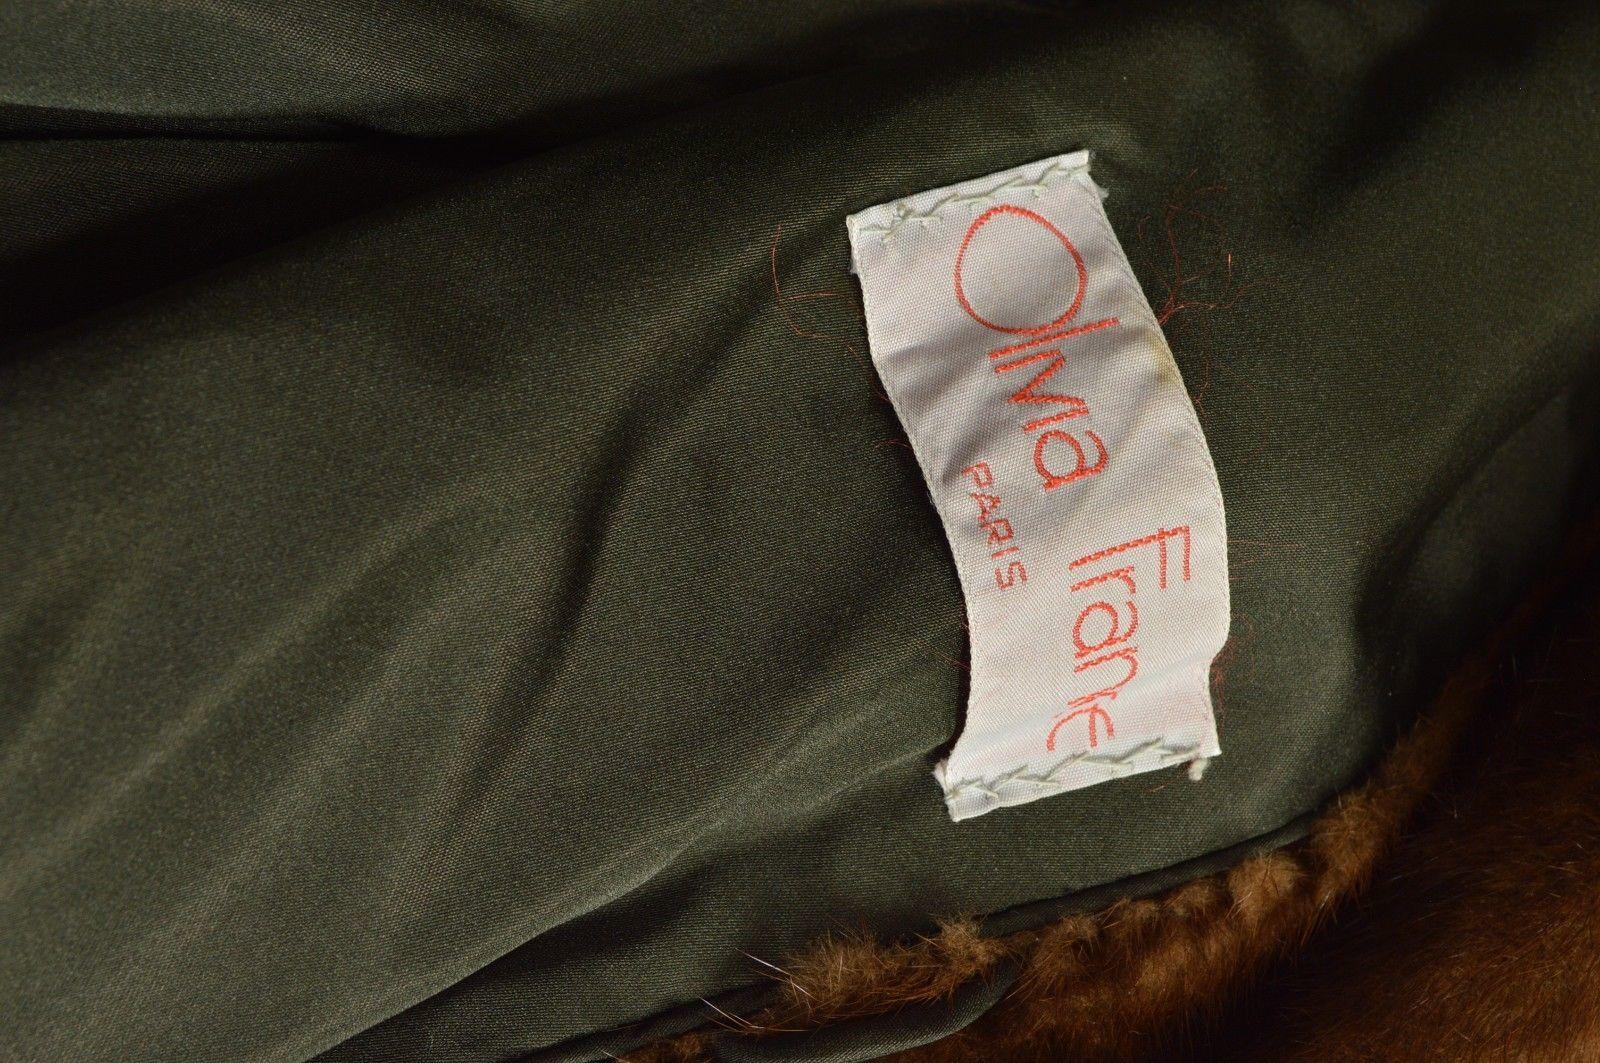 1 France Olivia fur mink coat FR 44 full length mahogany chic sophisticated